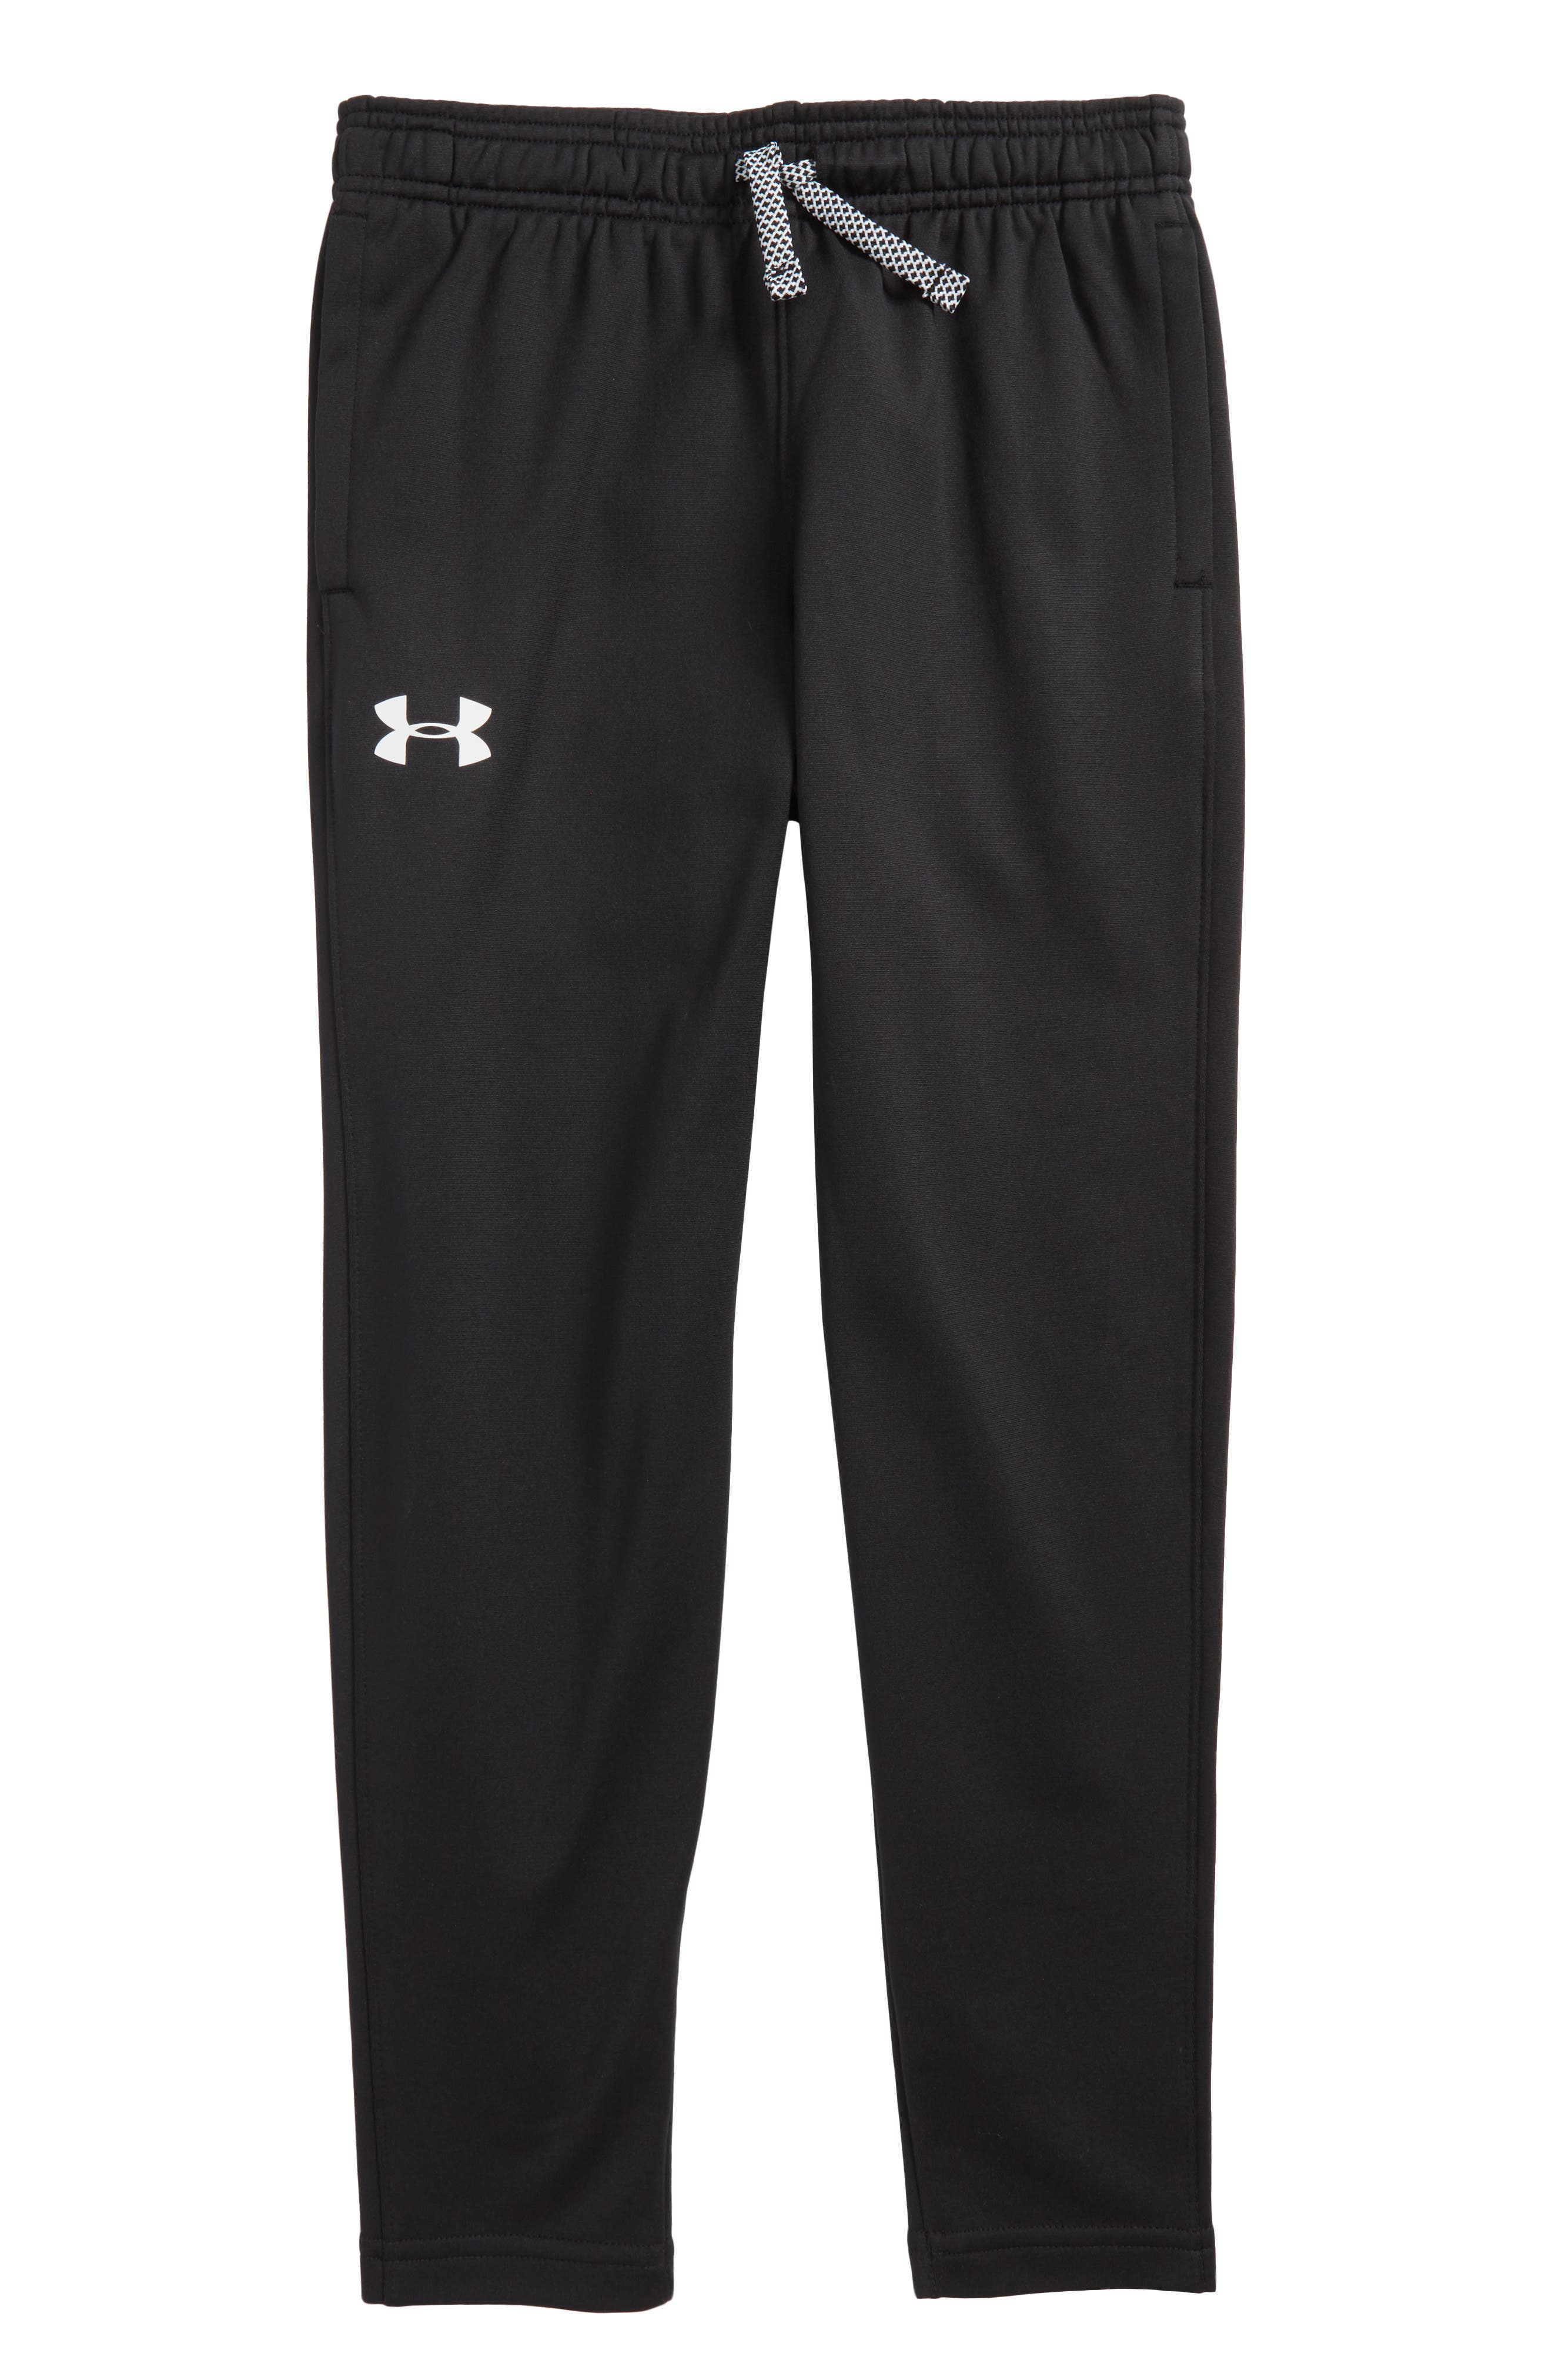 Brawler Tapered Sweatpants,                         Main,                         color, 001